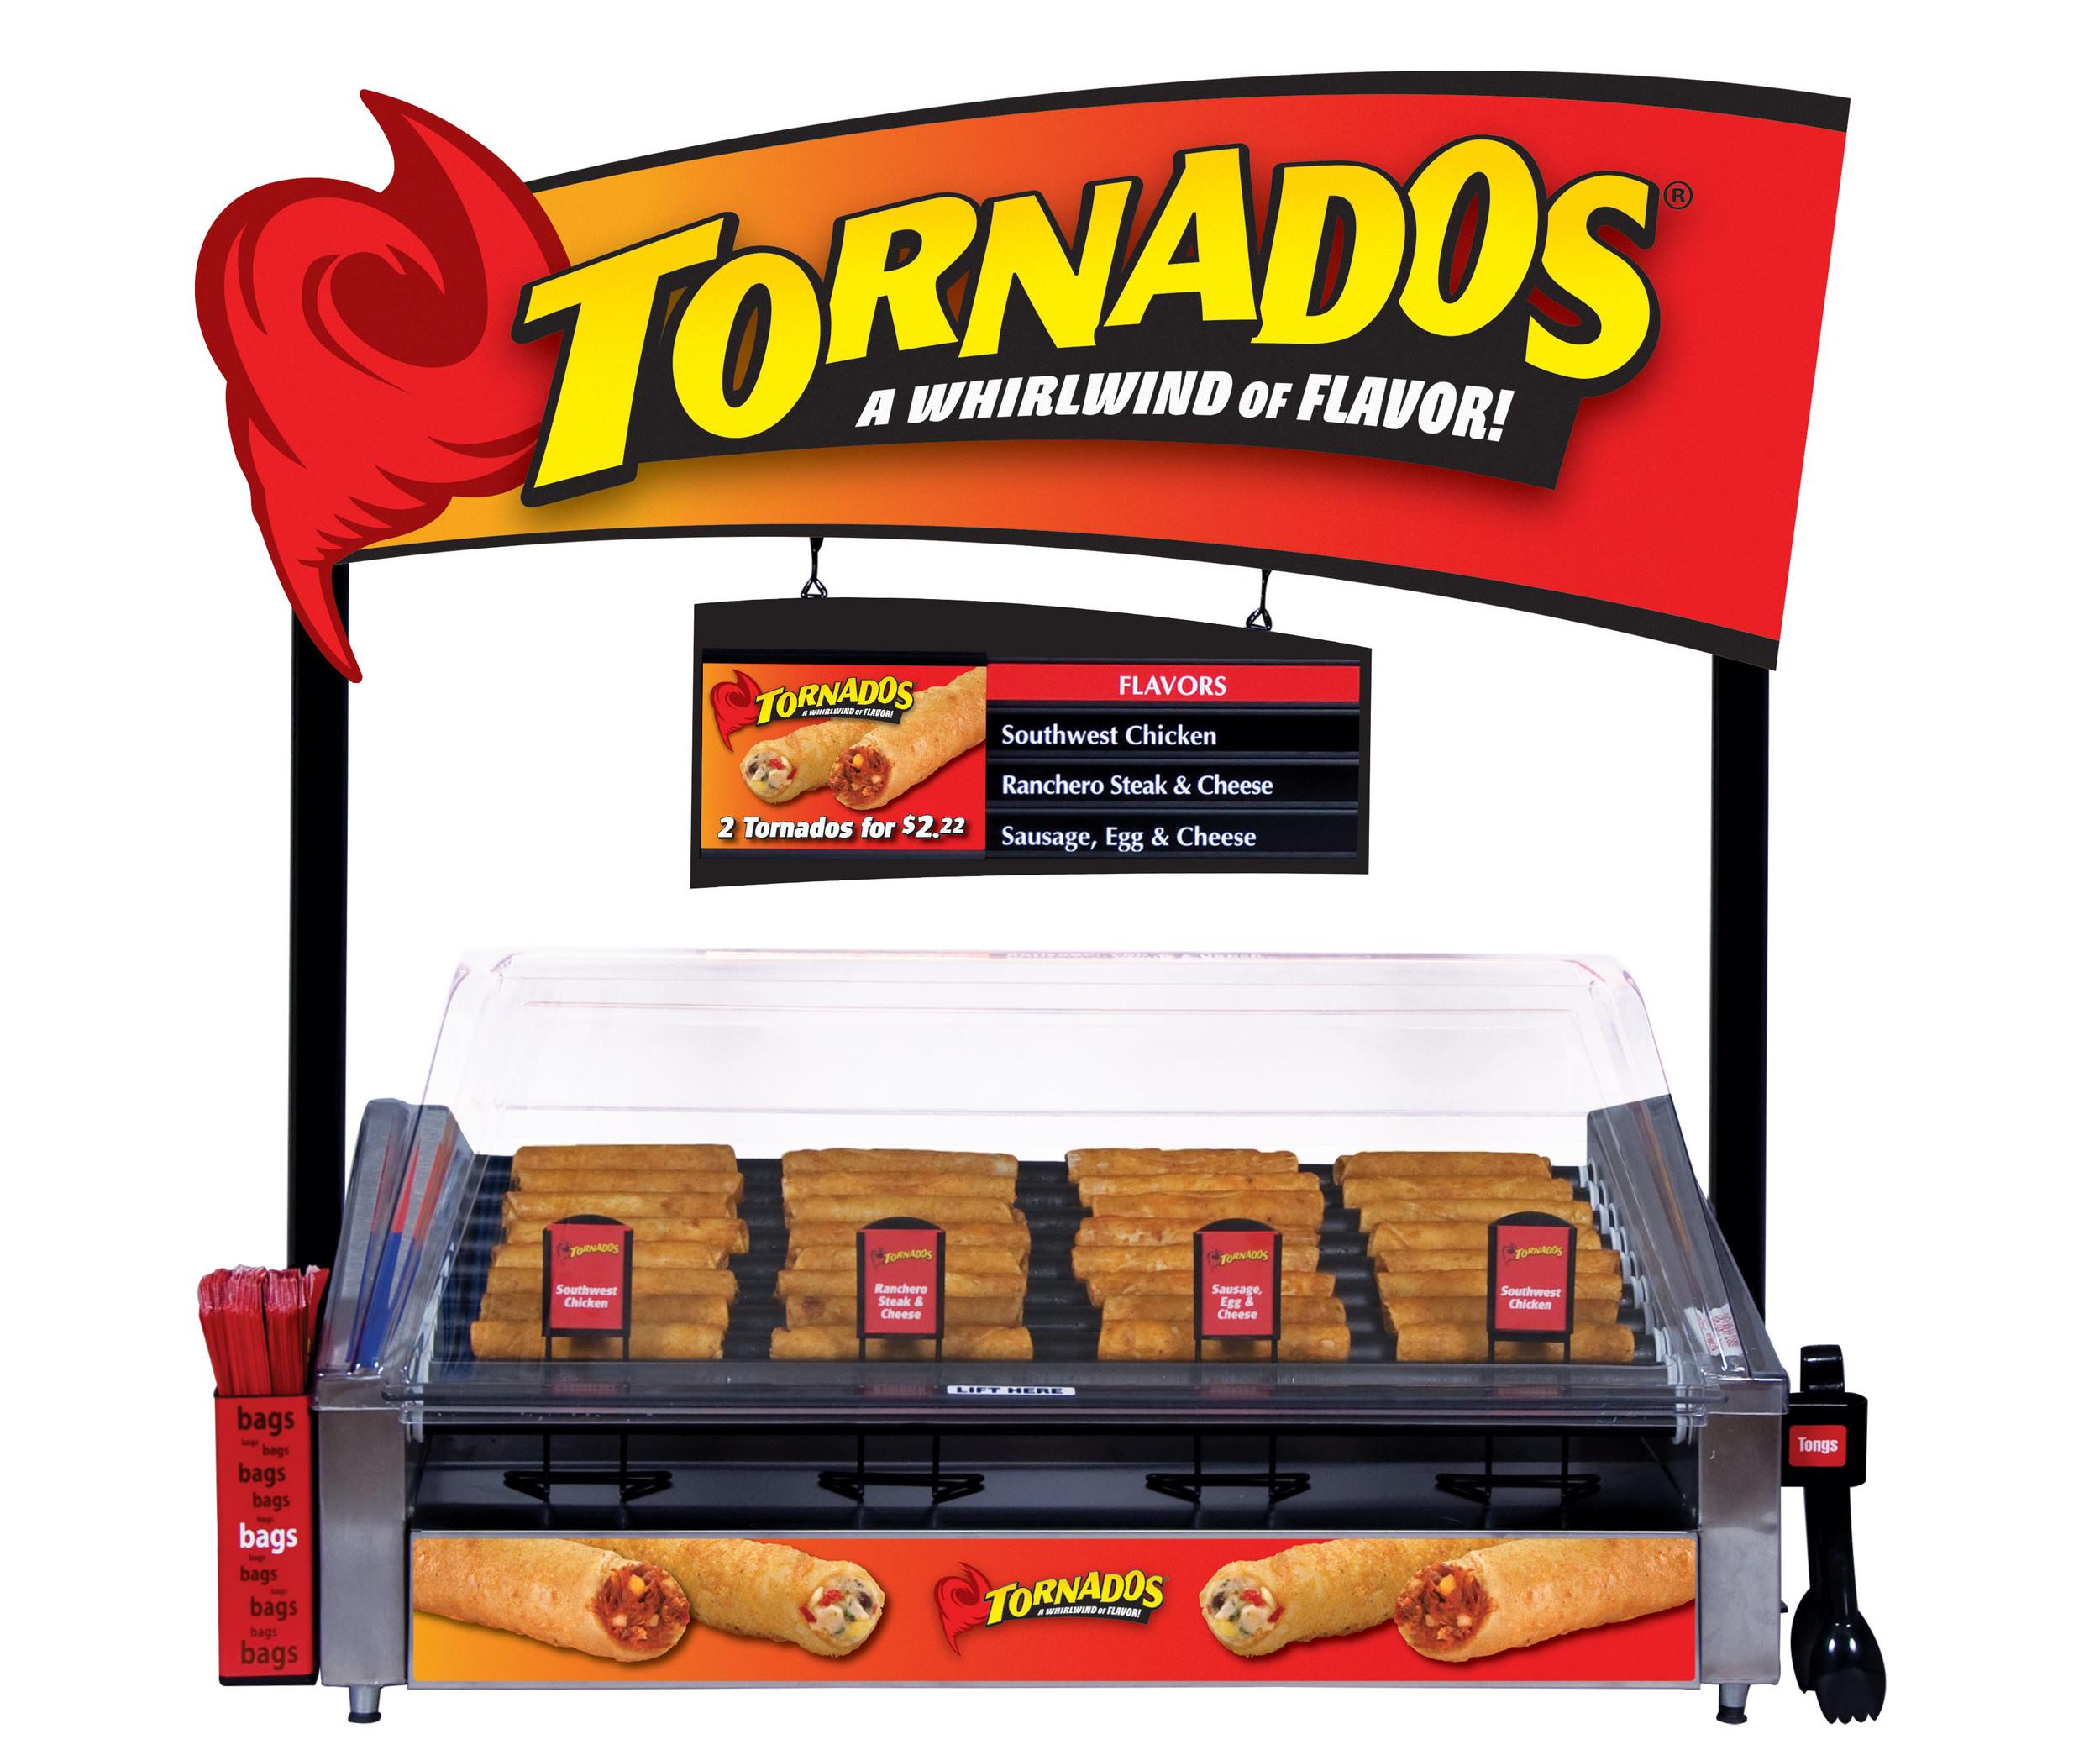 Ruiz-Tornados-Surround-Large-120.jpg